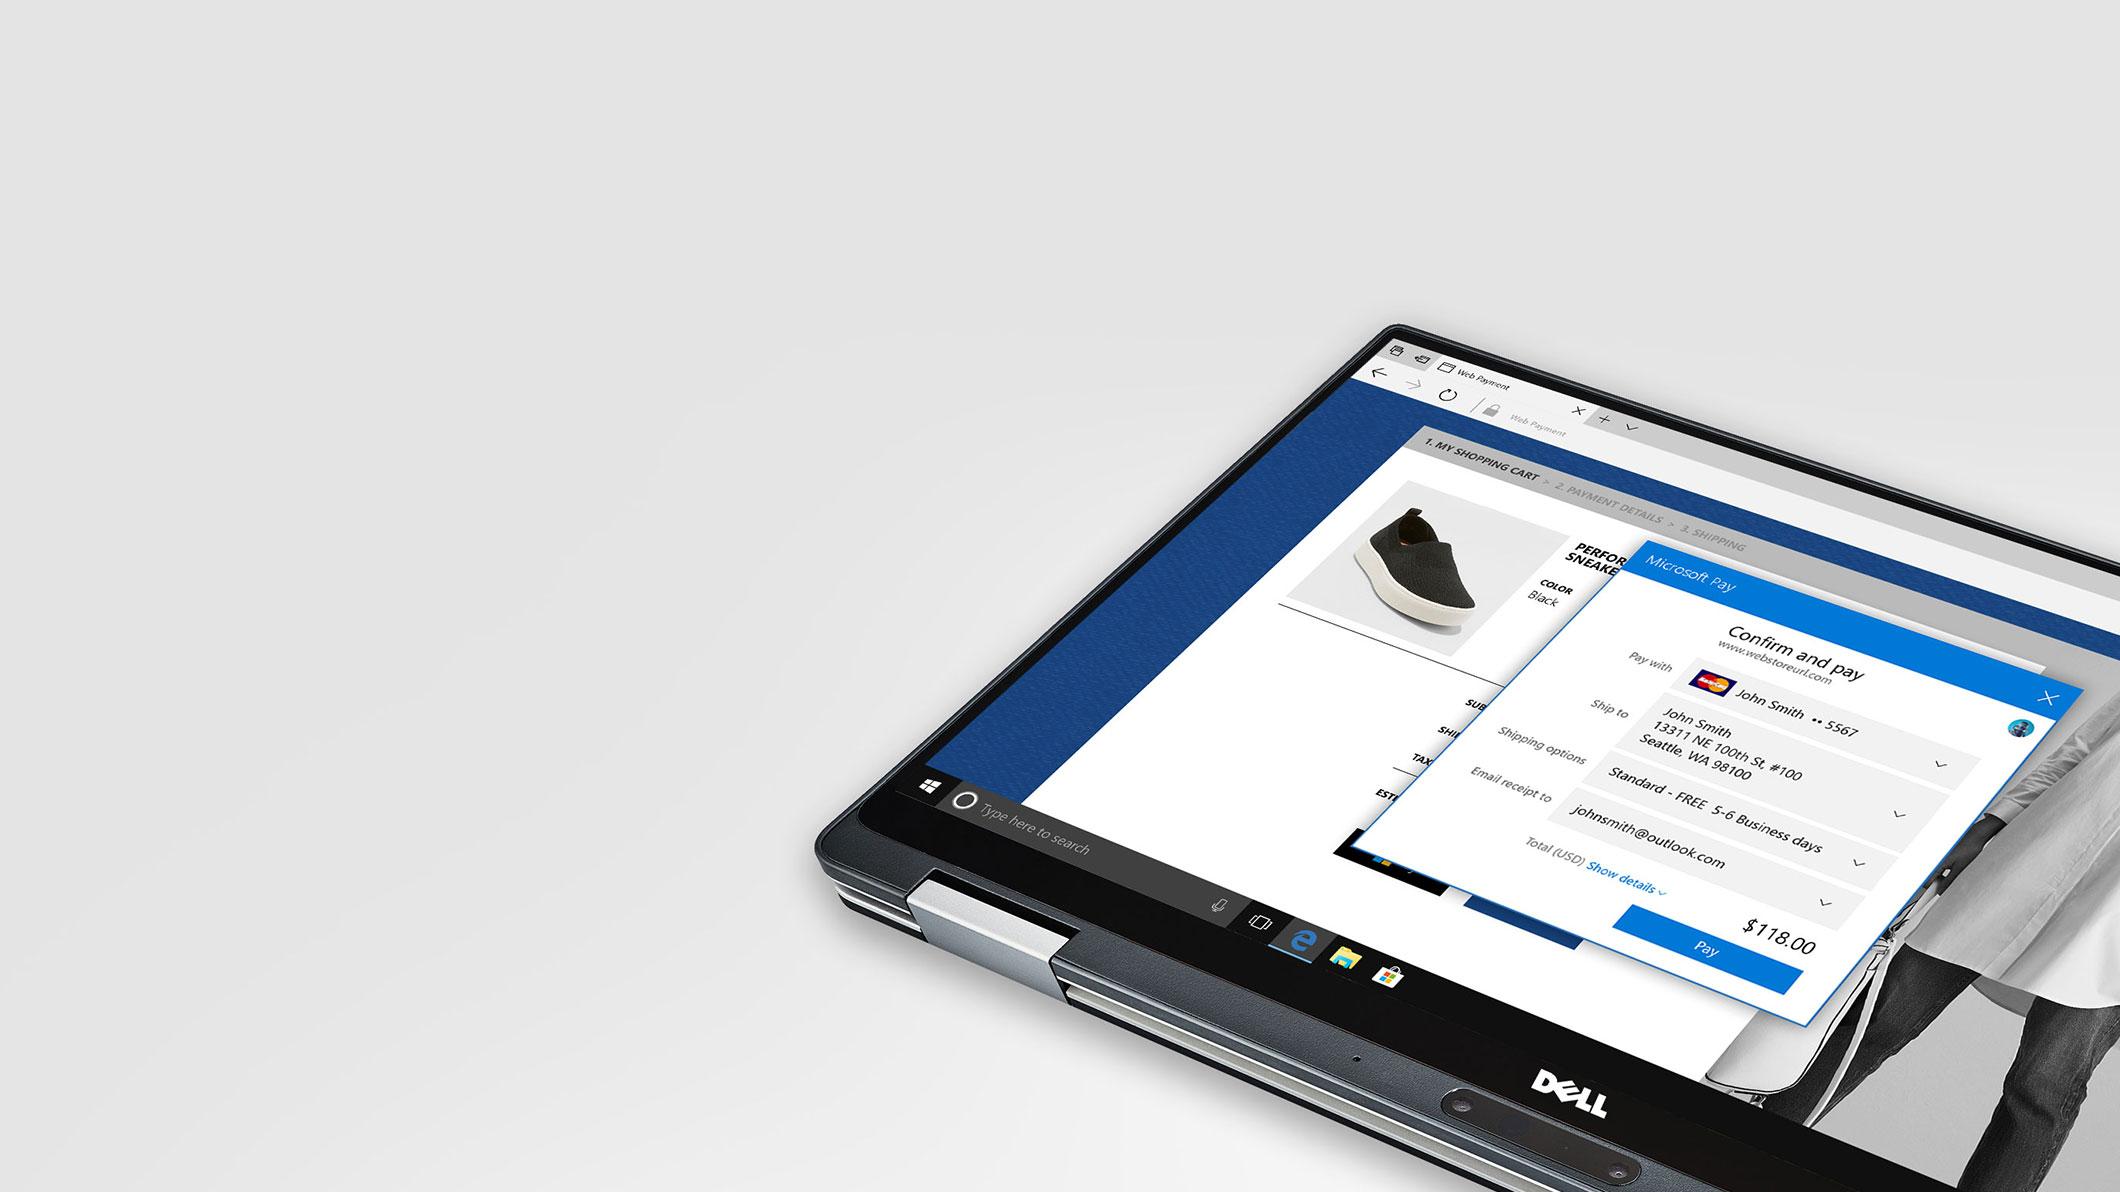 A laptop screen displays an online checkout form